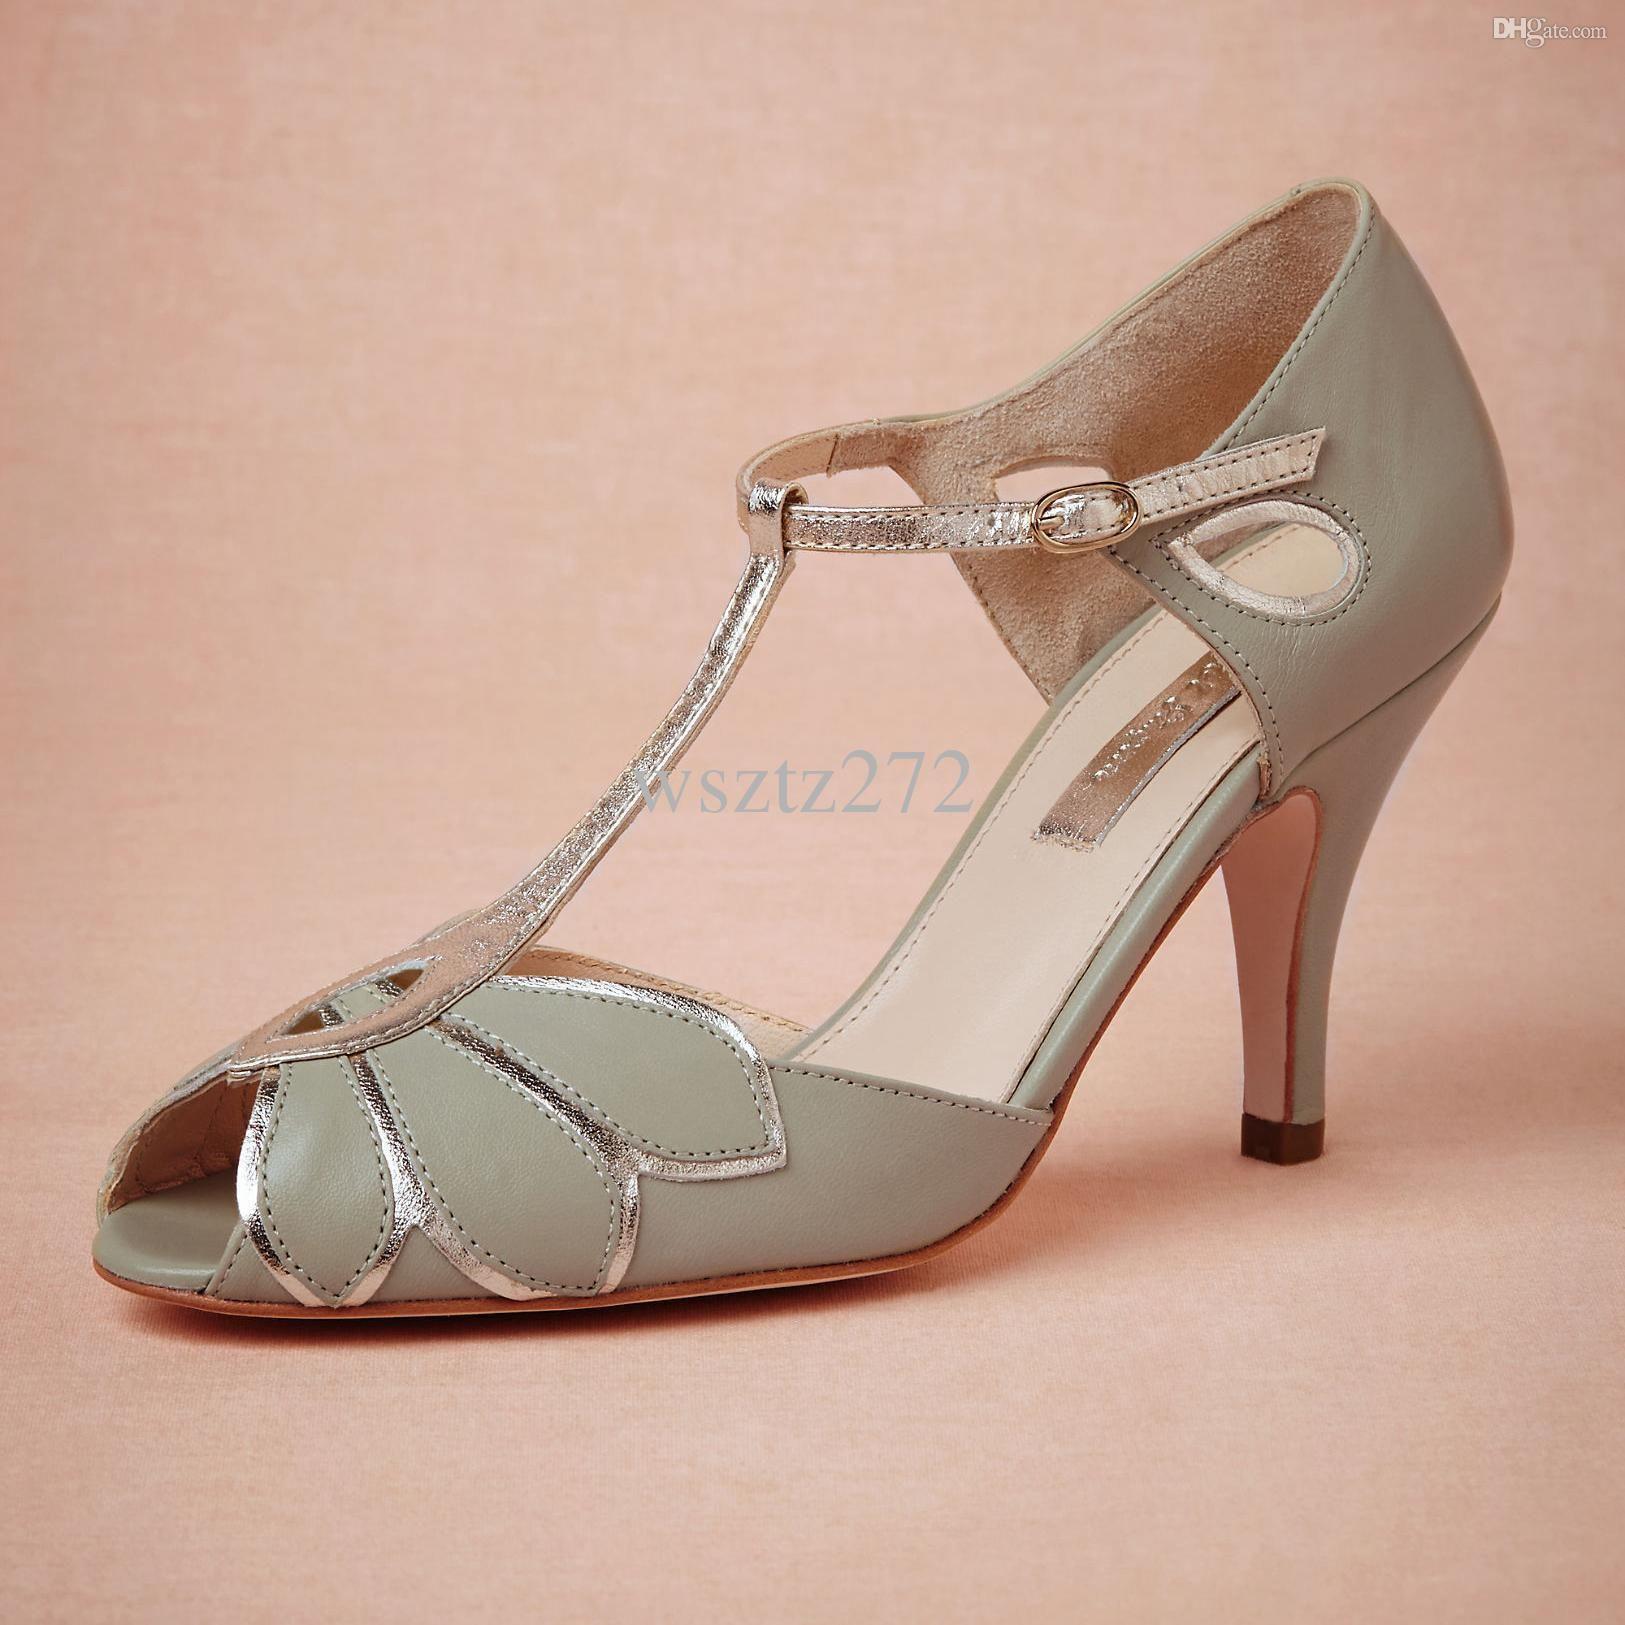 Vintage Mint Wedding Shoes Wedding Pumps Mimosa T Straps Buckle Closure  Leather Party Dance 3 High Heels Women Sandals Short Wedding Boots Bridal Shoes  Size ...